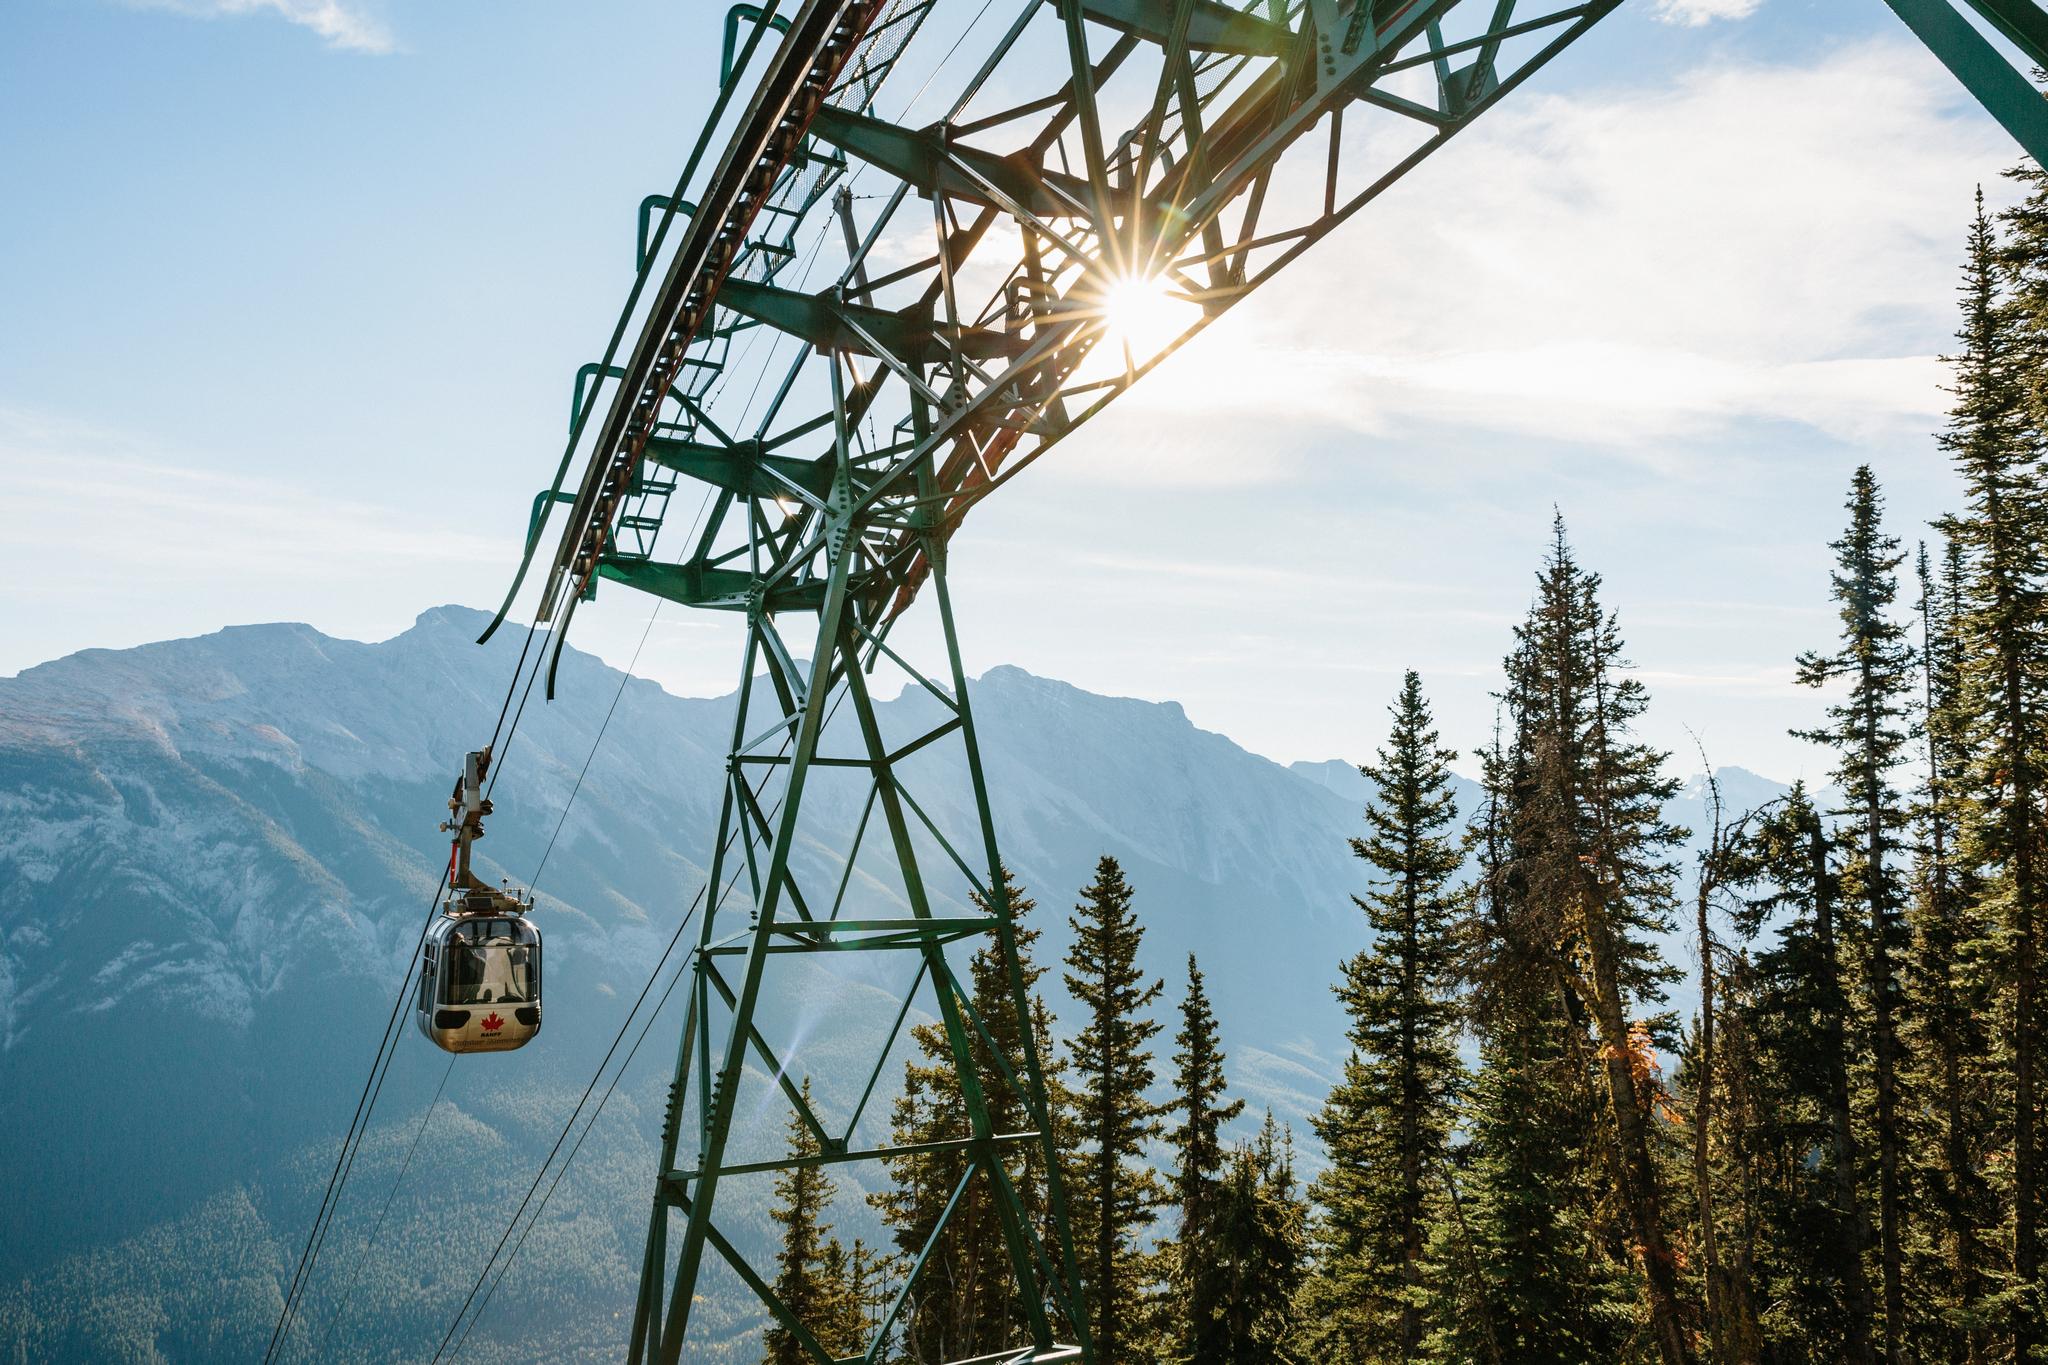 Sulphur Mountain Banff Gondola Ride Ticket